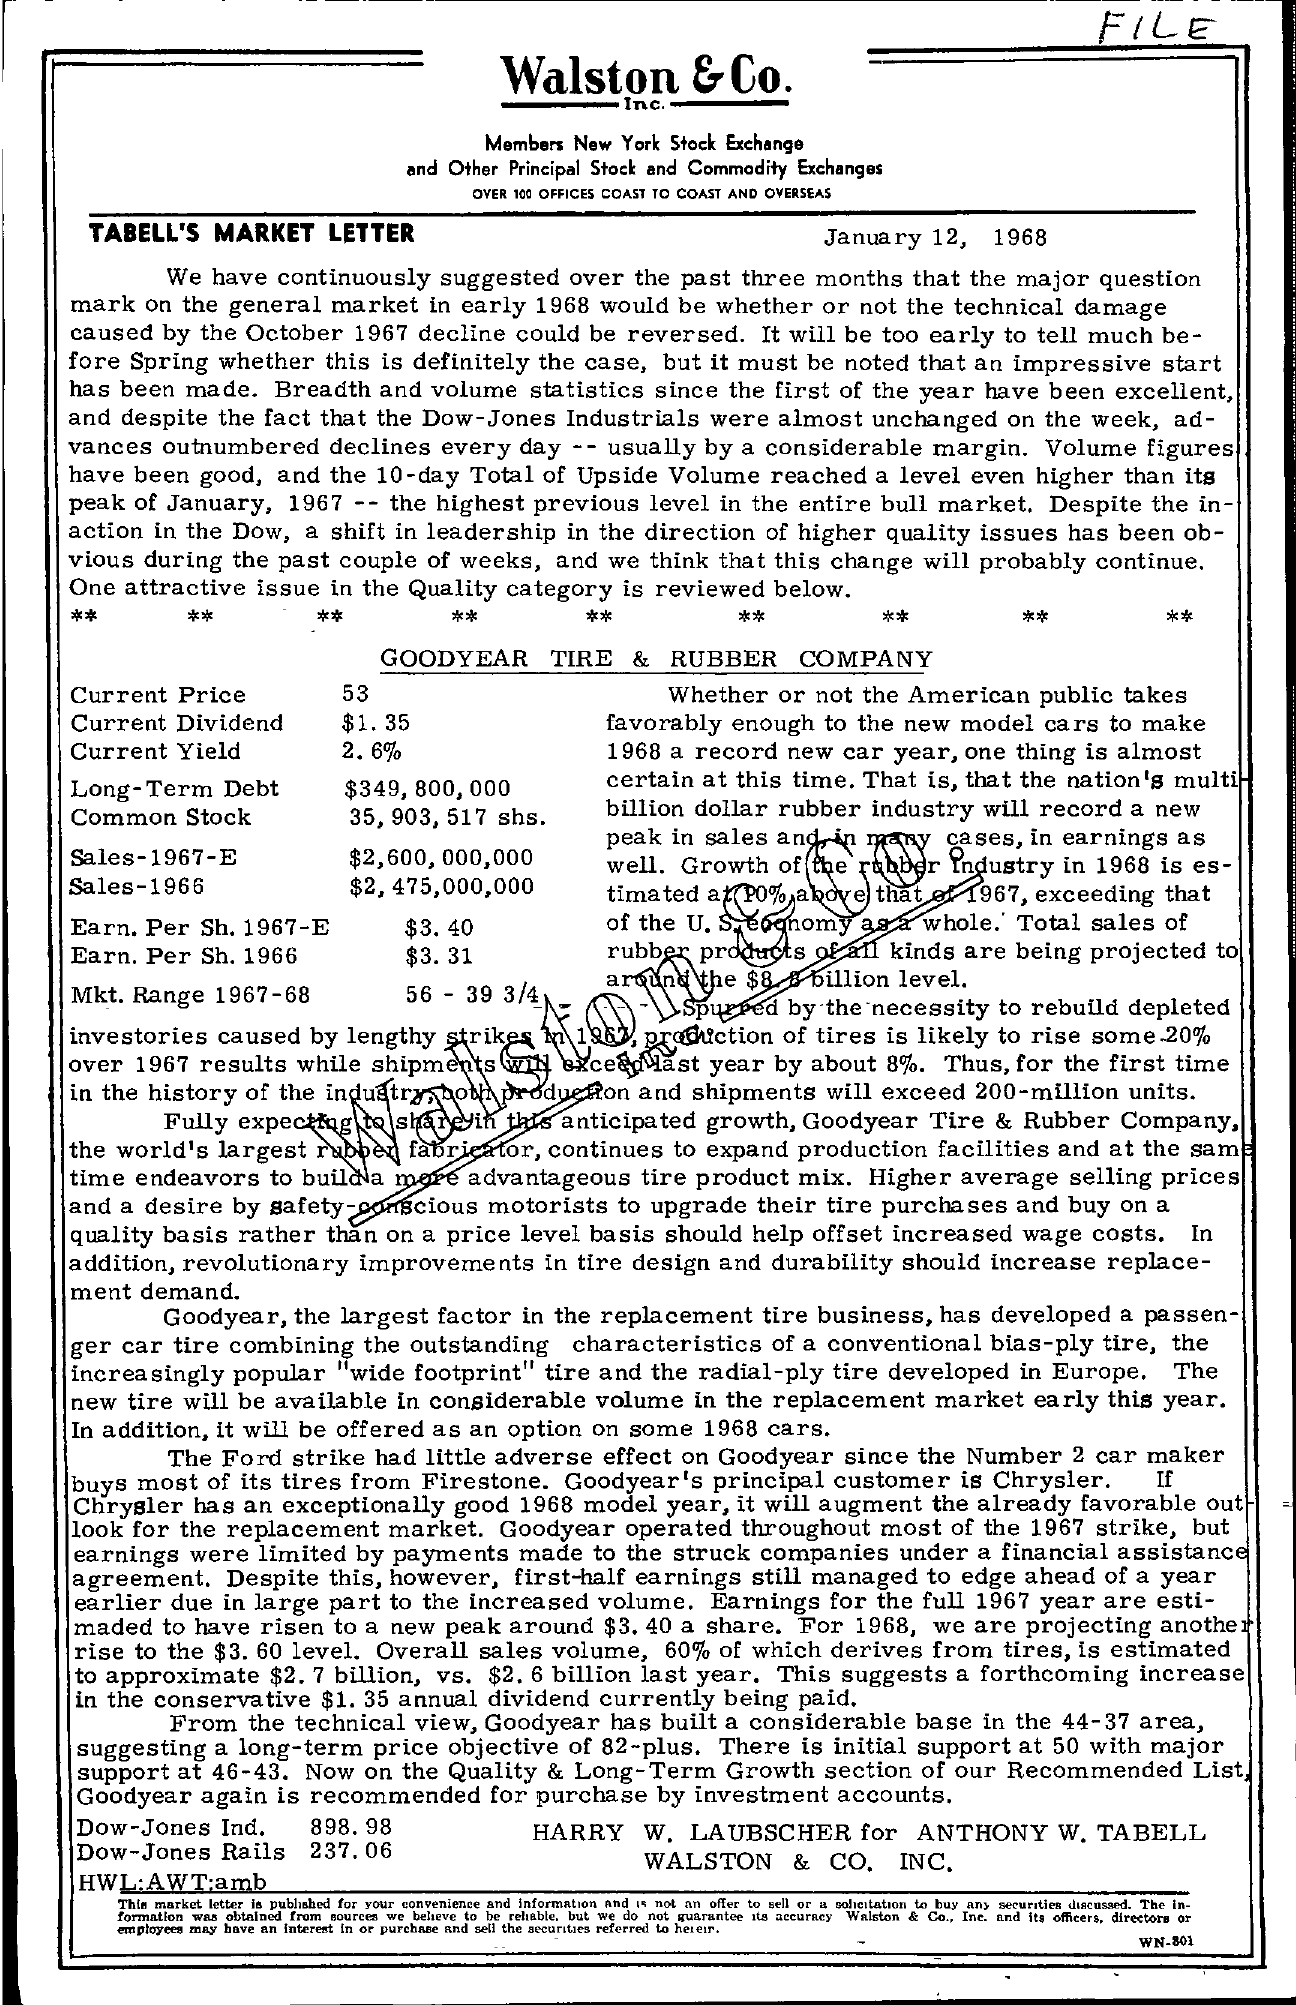 Tabell's Market Letter - January 12, 1968